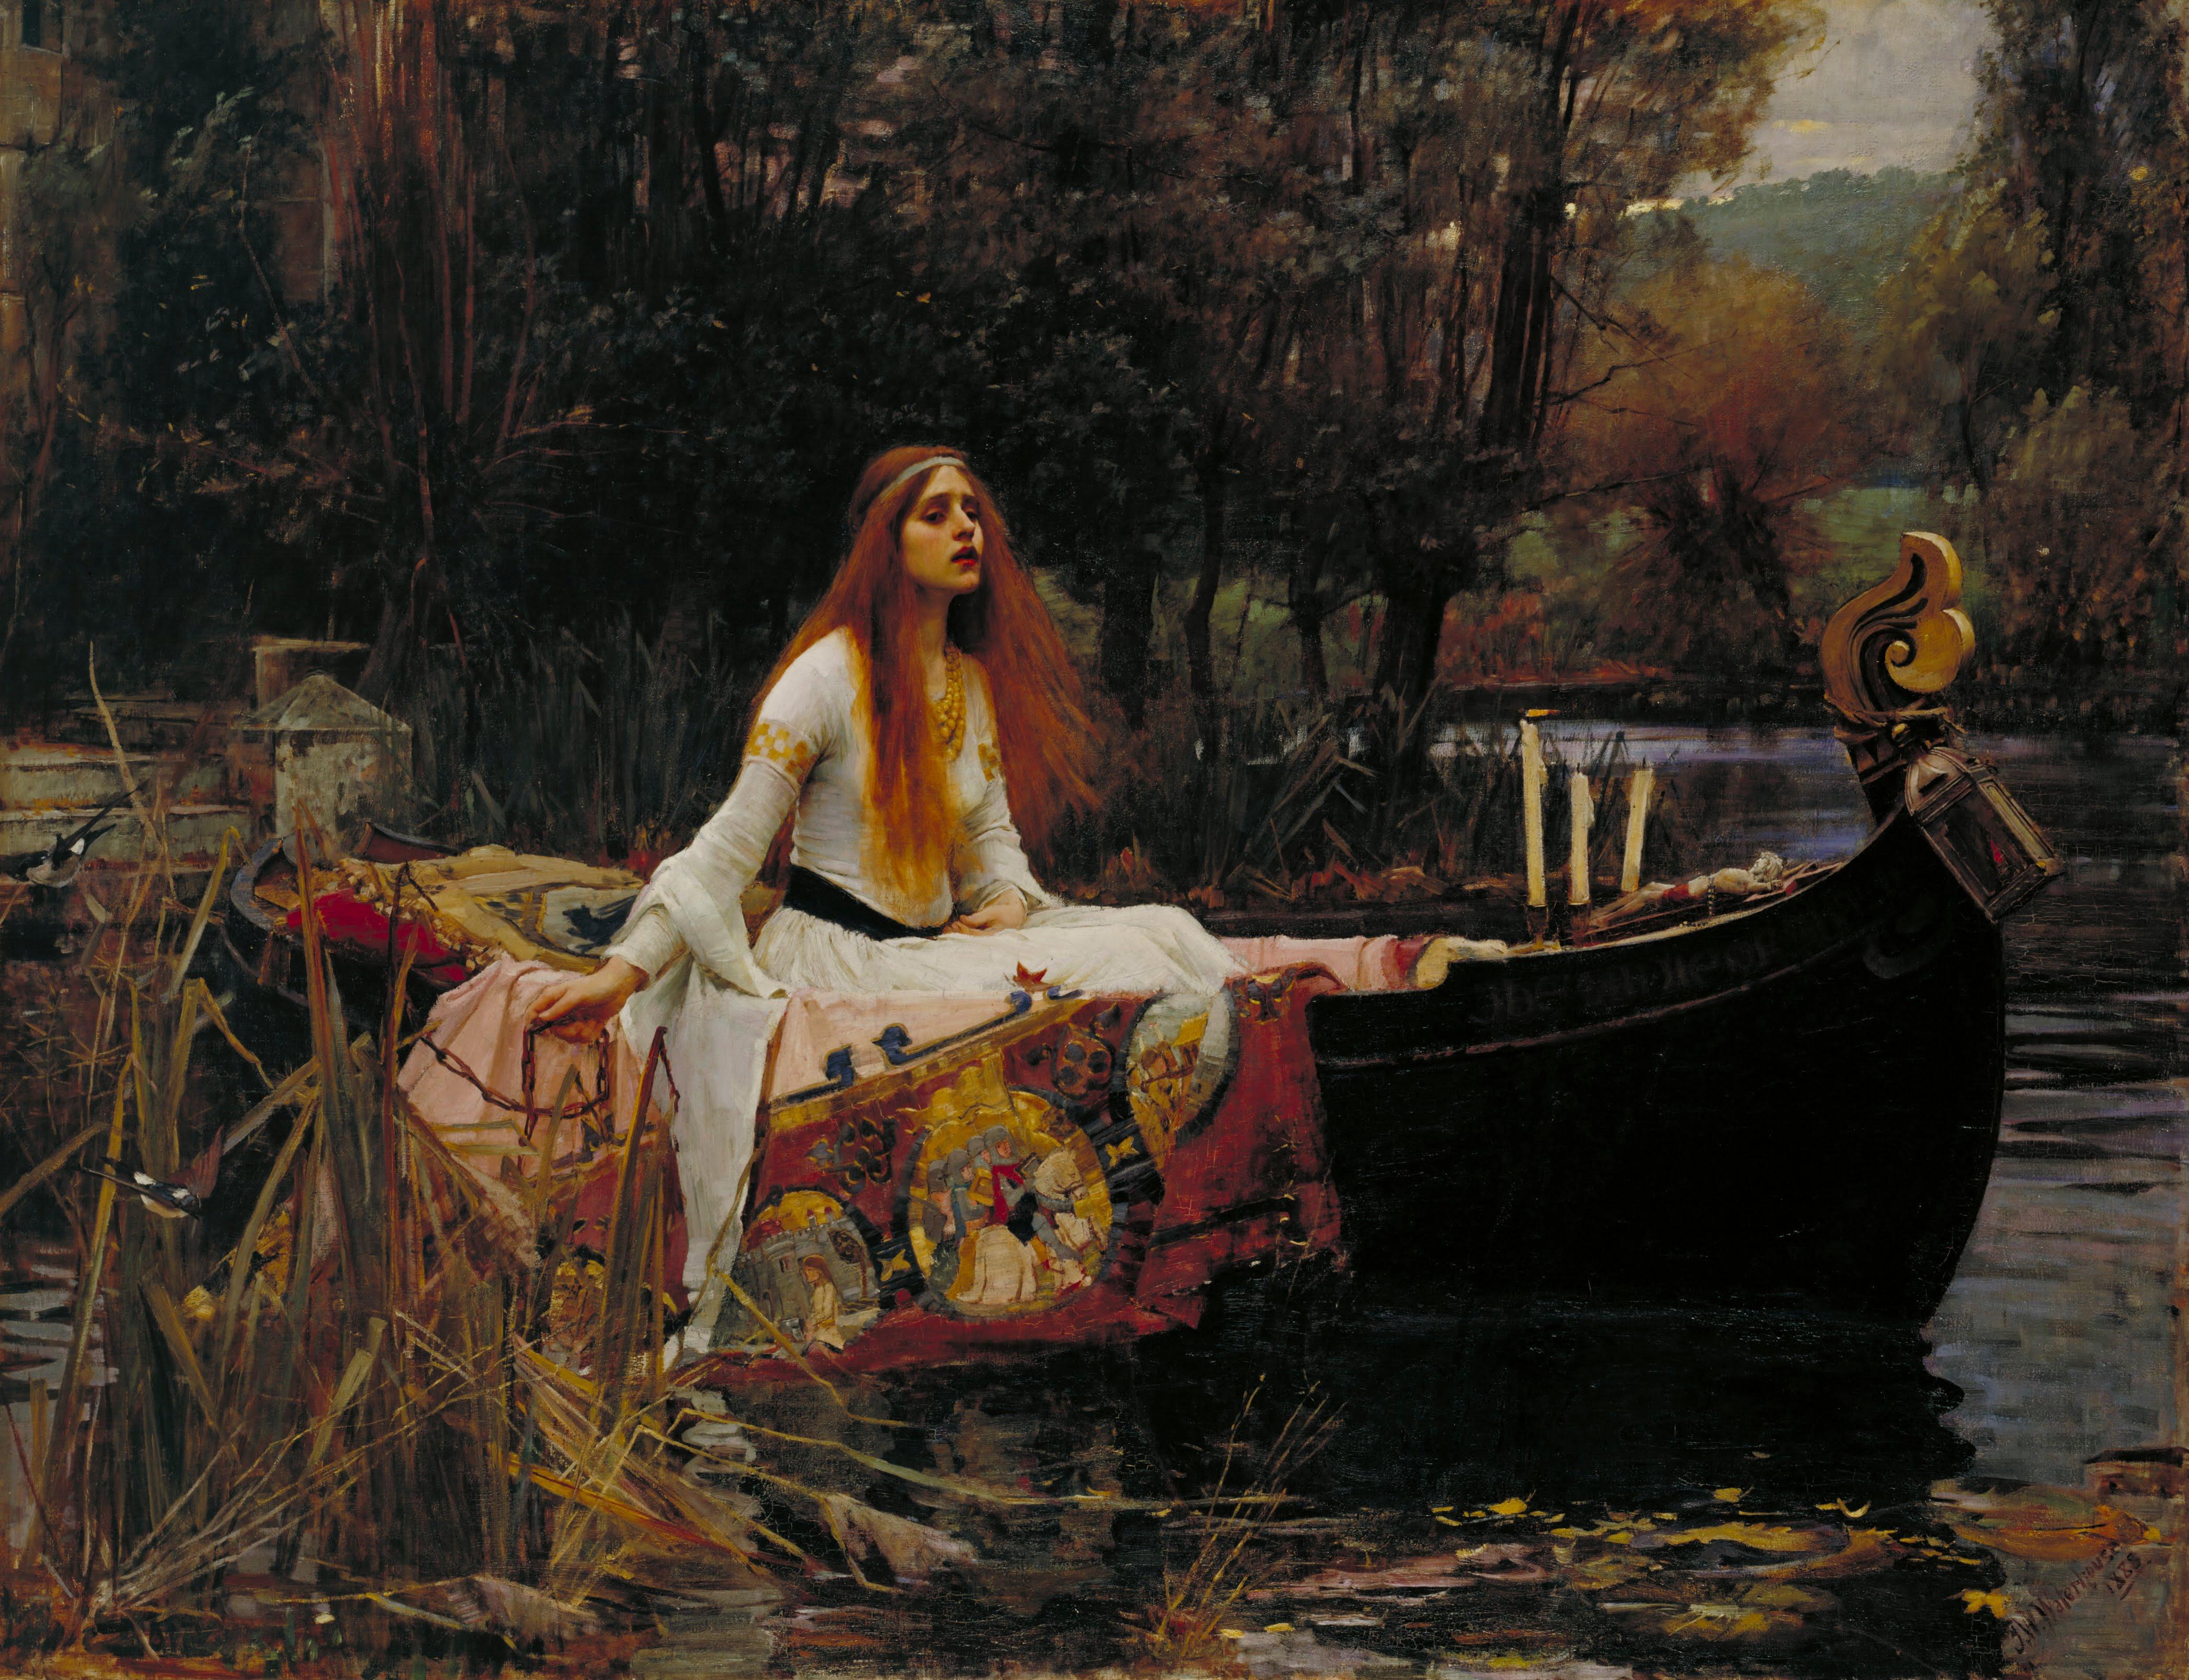 The Lady of Shalott: A Post Pre-Raphaelite Endeavour